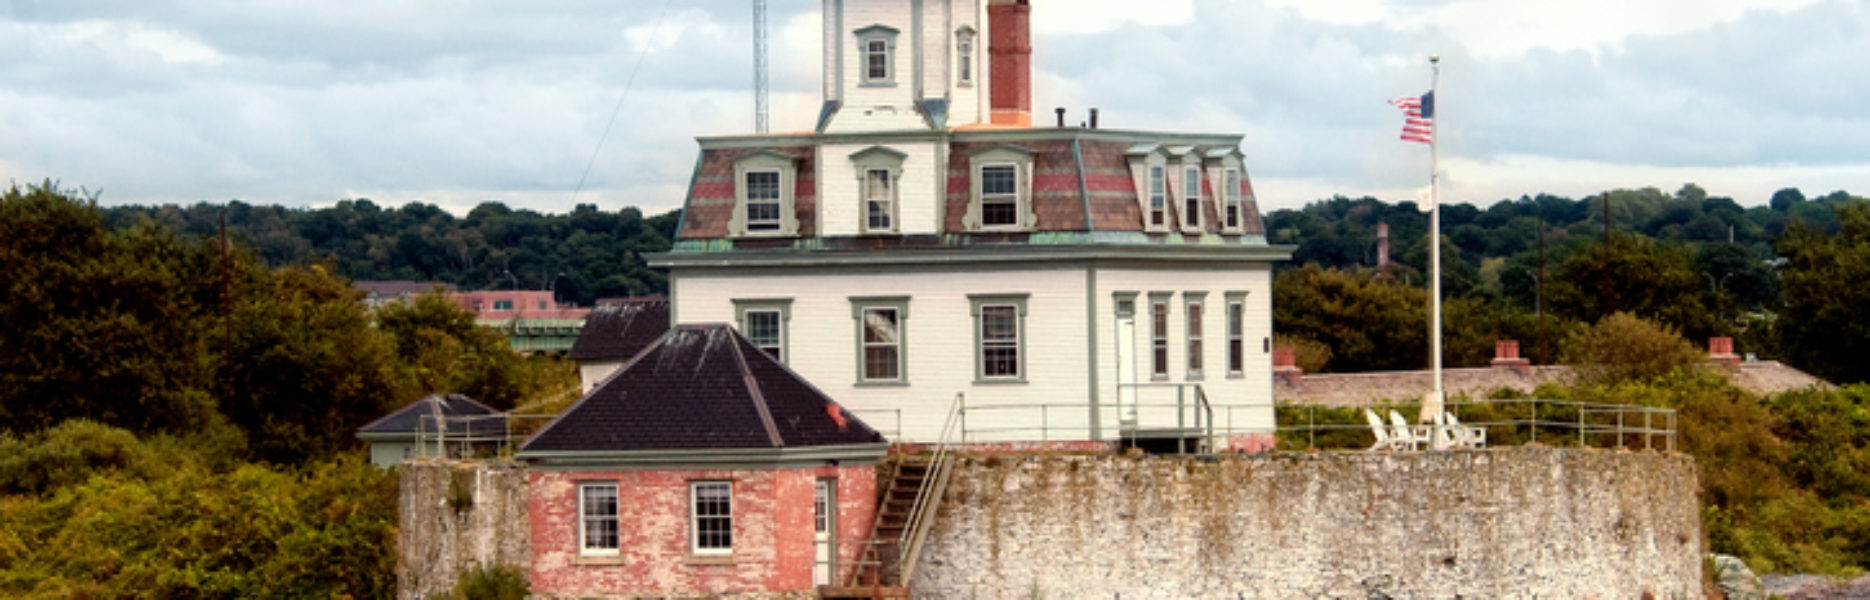 Newport, RI Harbor Sights: Spotlight on Rose Island